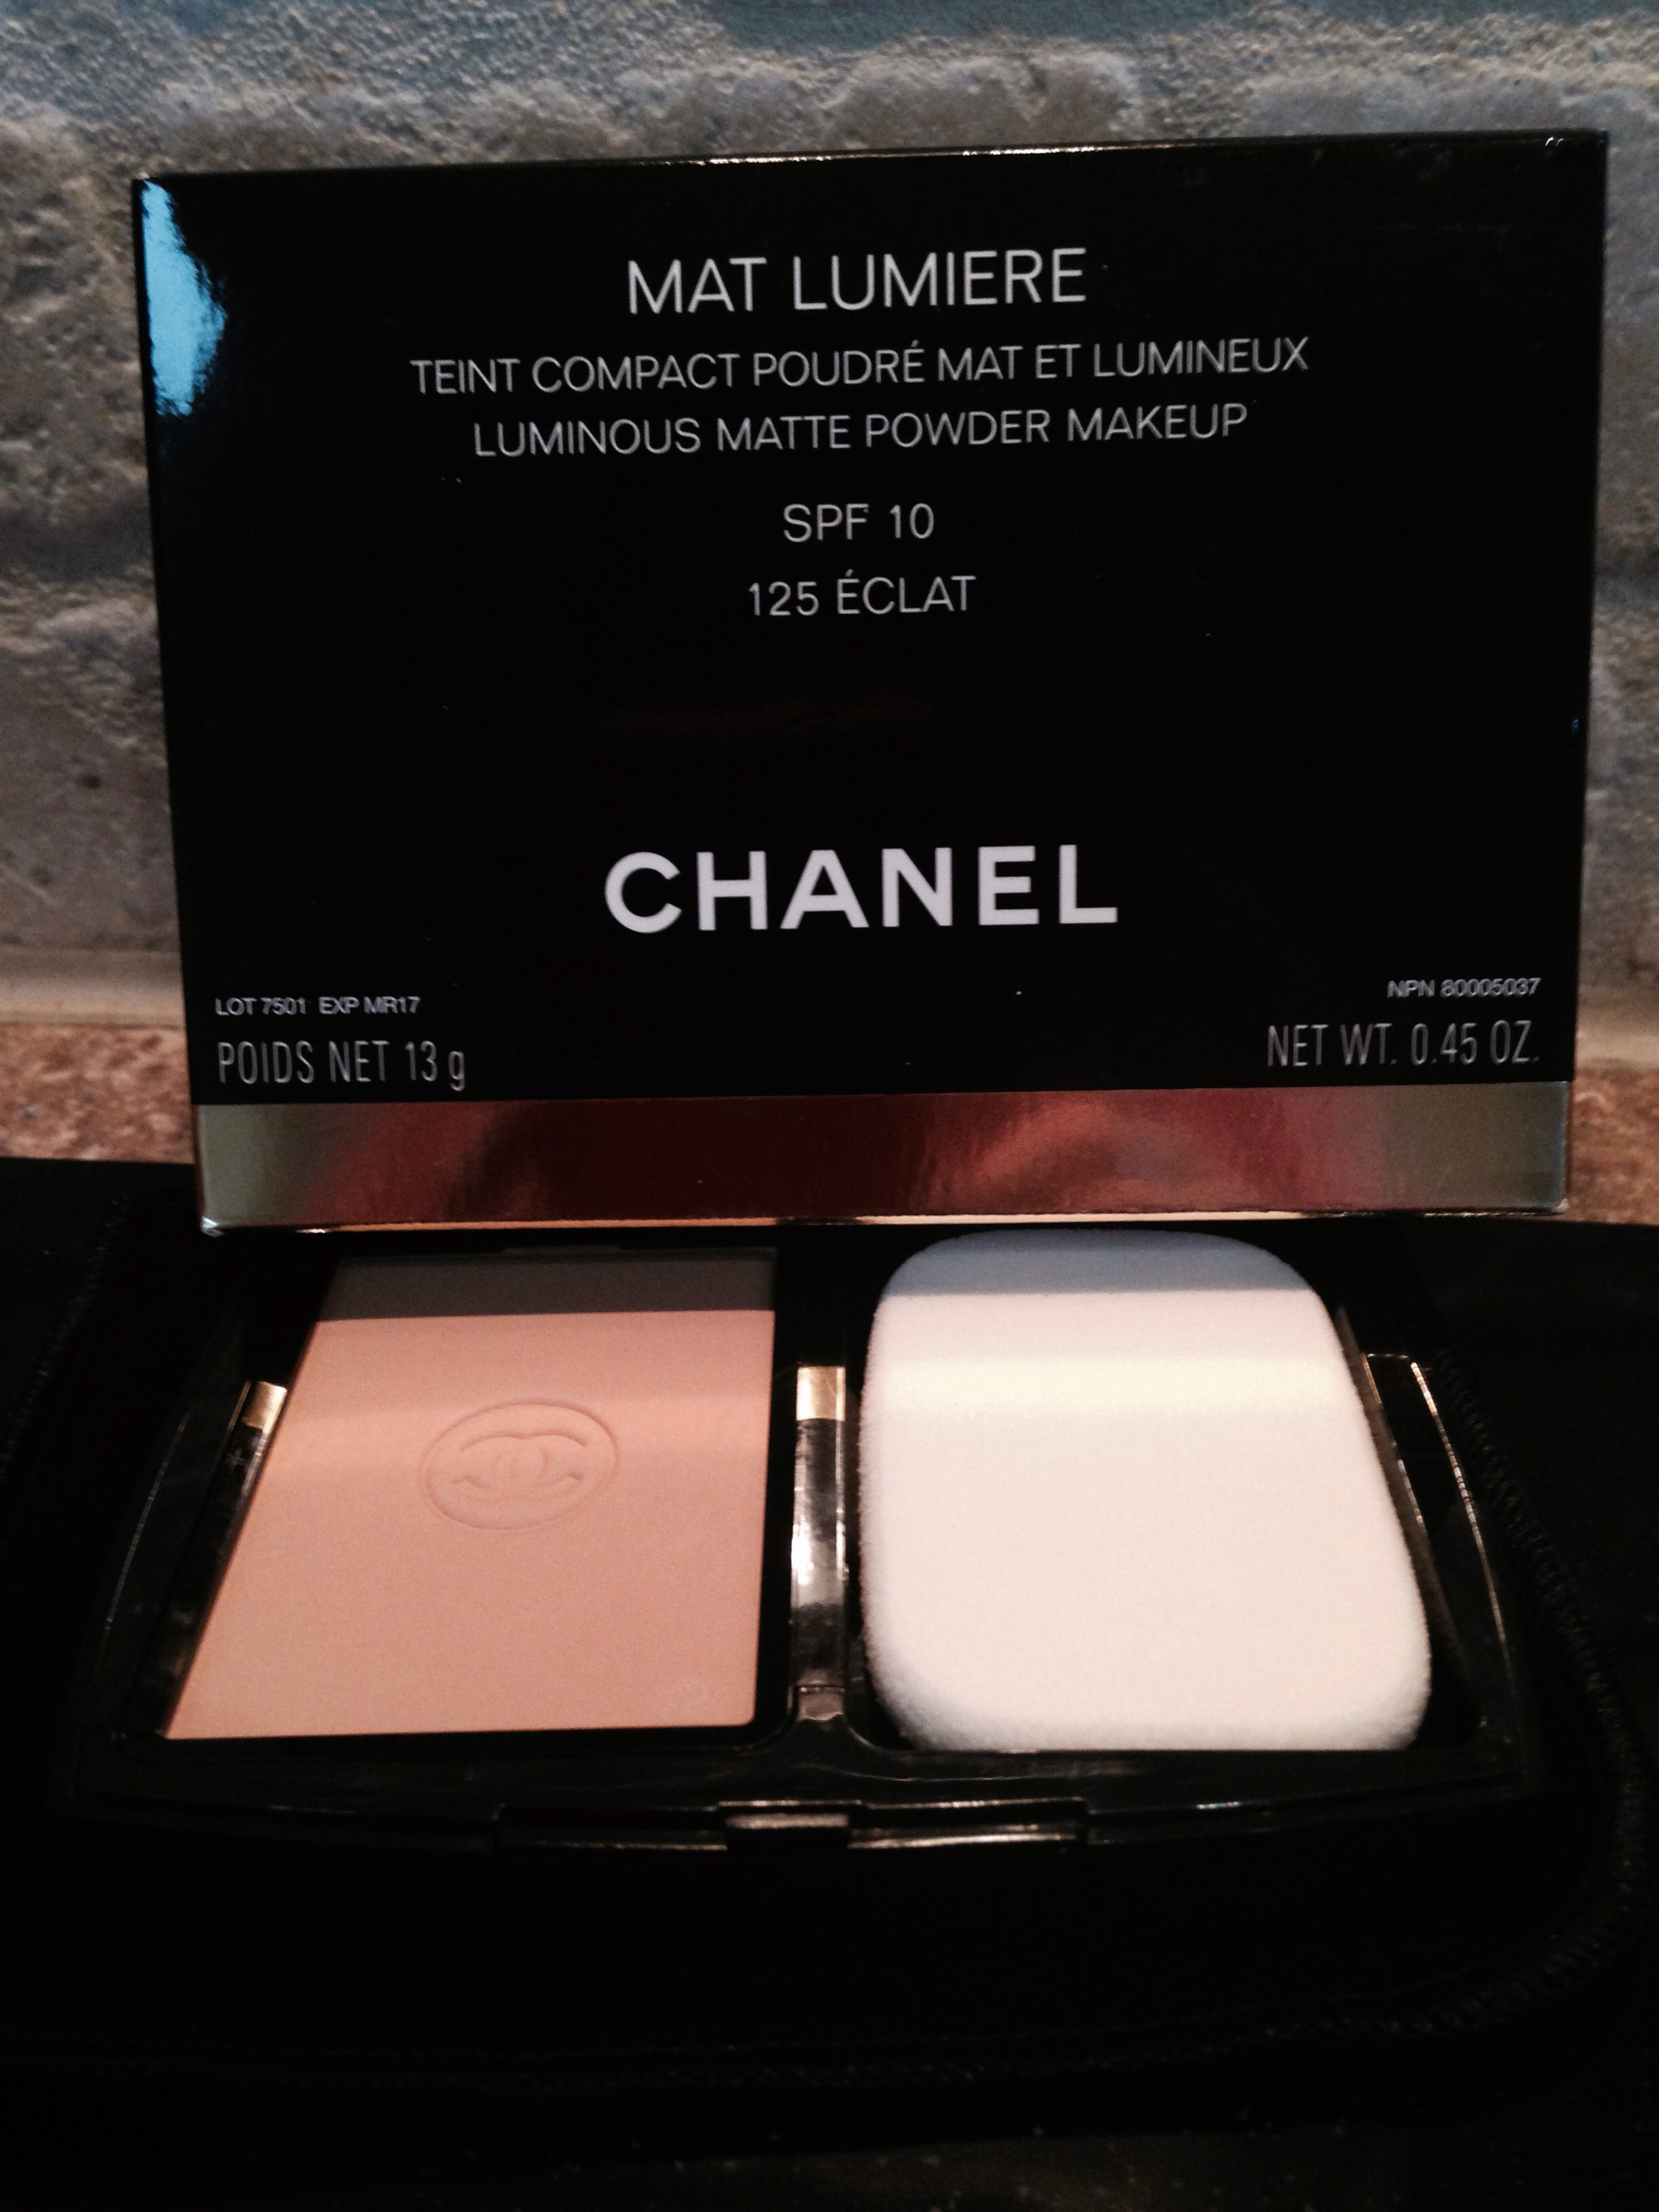 Chanel Mat Lumiere Luminous Matte Powder Makeup Reviews In